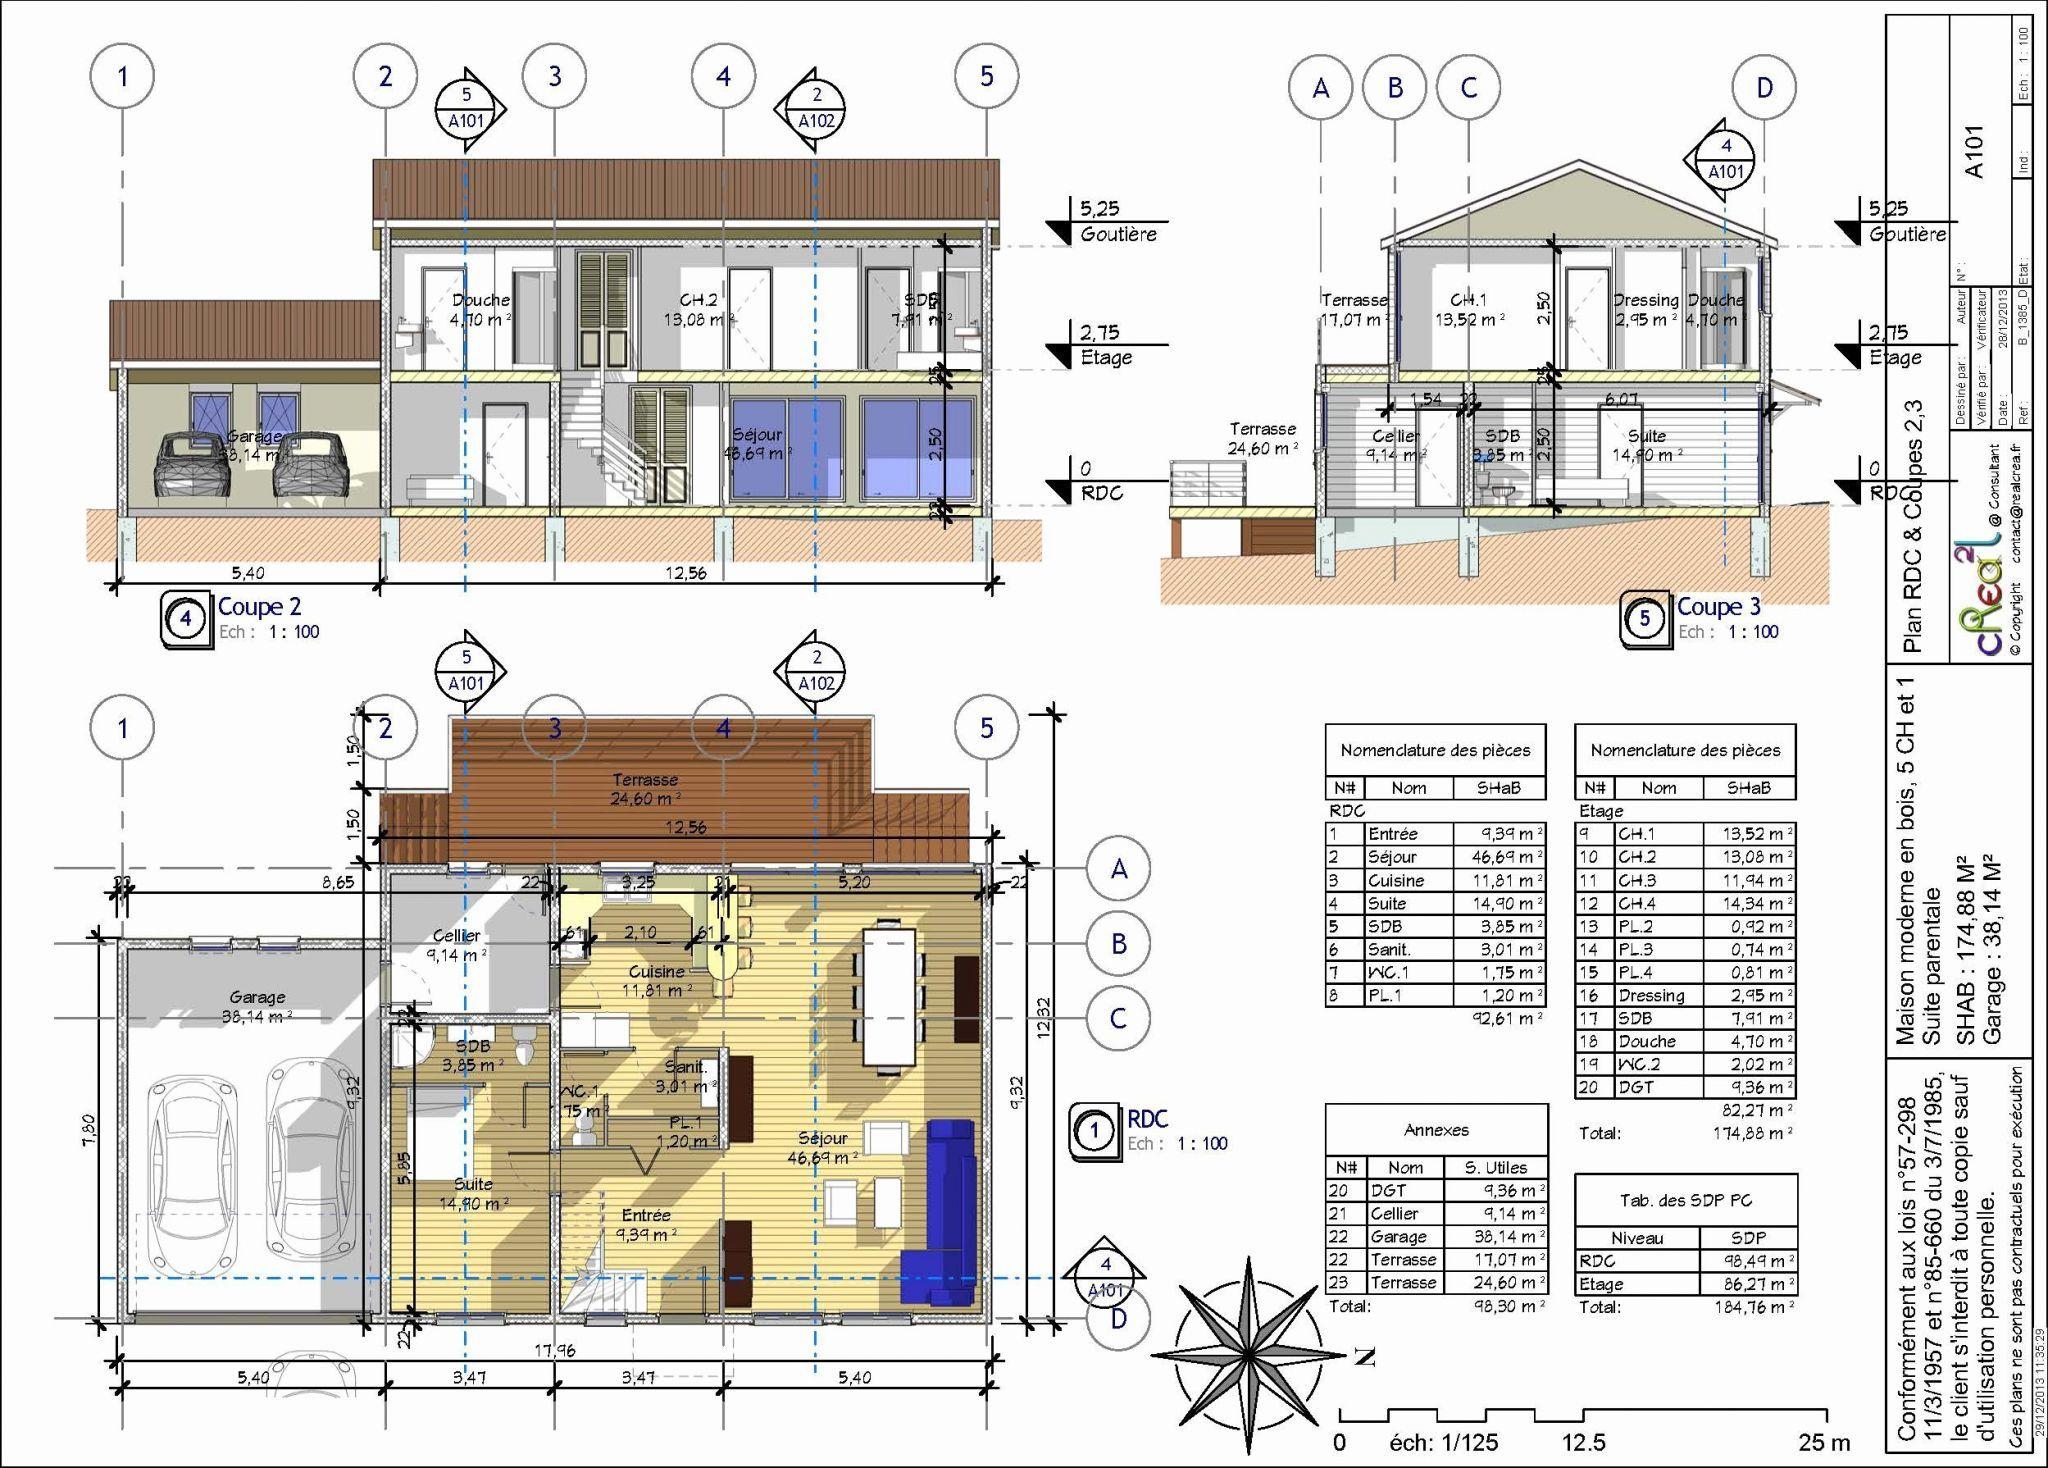 Plan Abri De Jardin En Bois logiciel gratuit construction abri de jardin in 2020 | floor